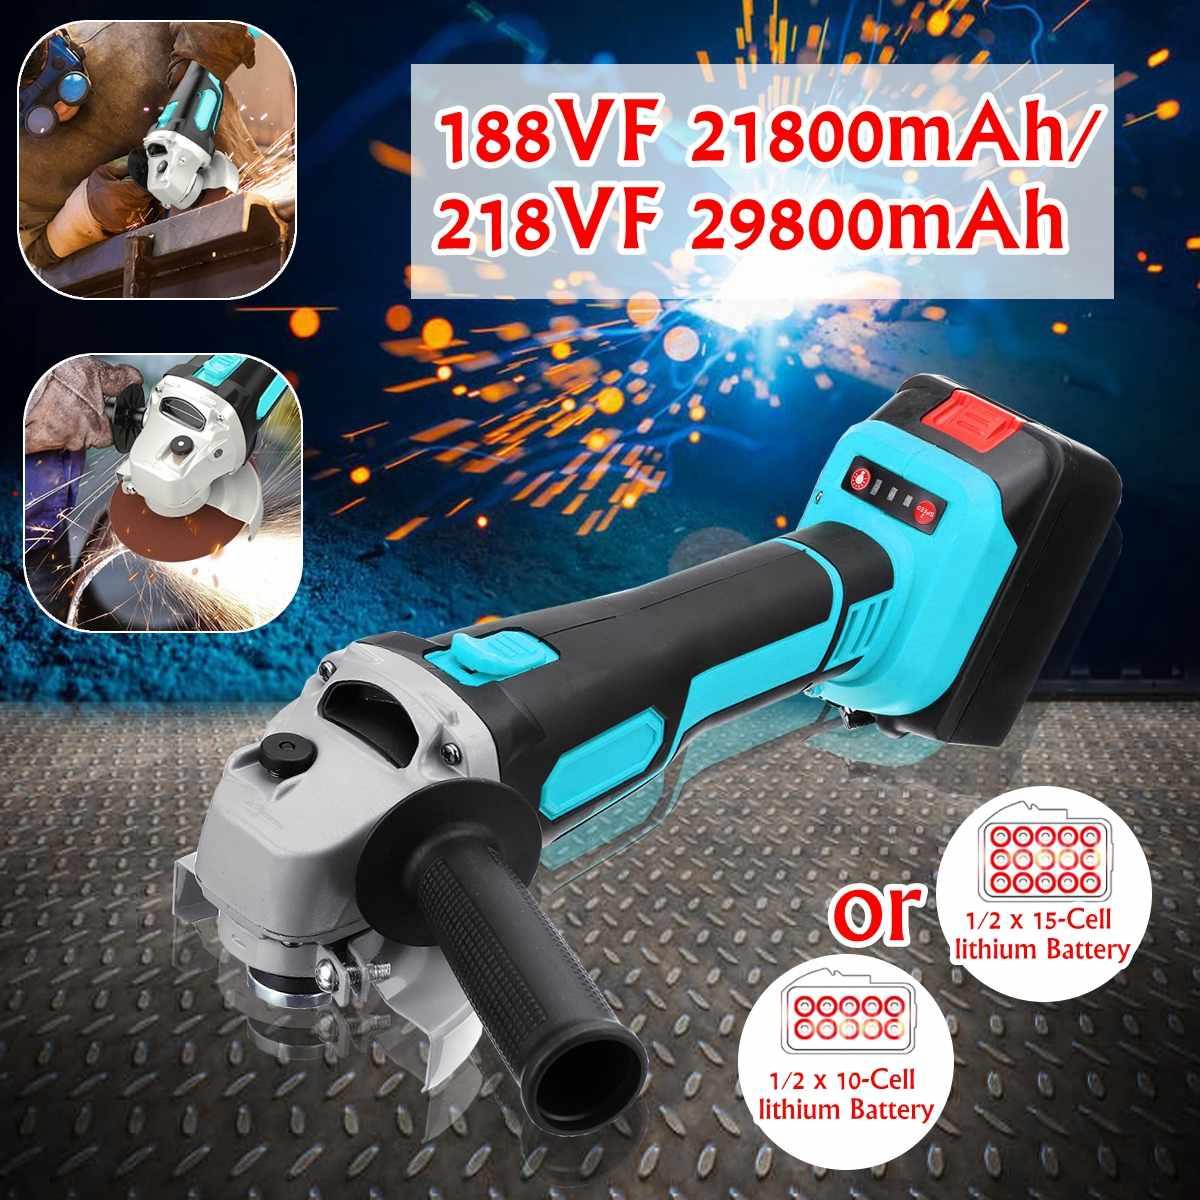 21800mah/29800mah Lithium Battery Electric Angle Grinder Electric Grinding Machine Cordless Polishing Machine Cutting Tool